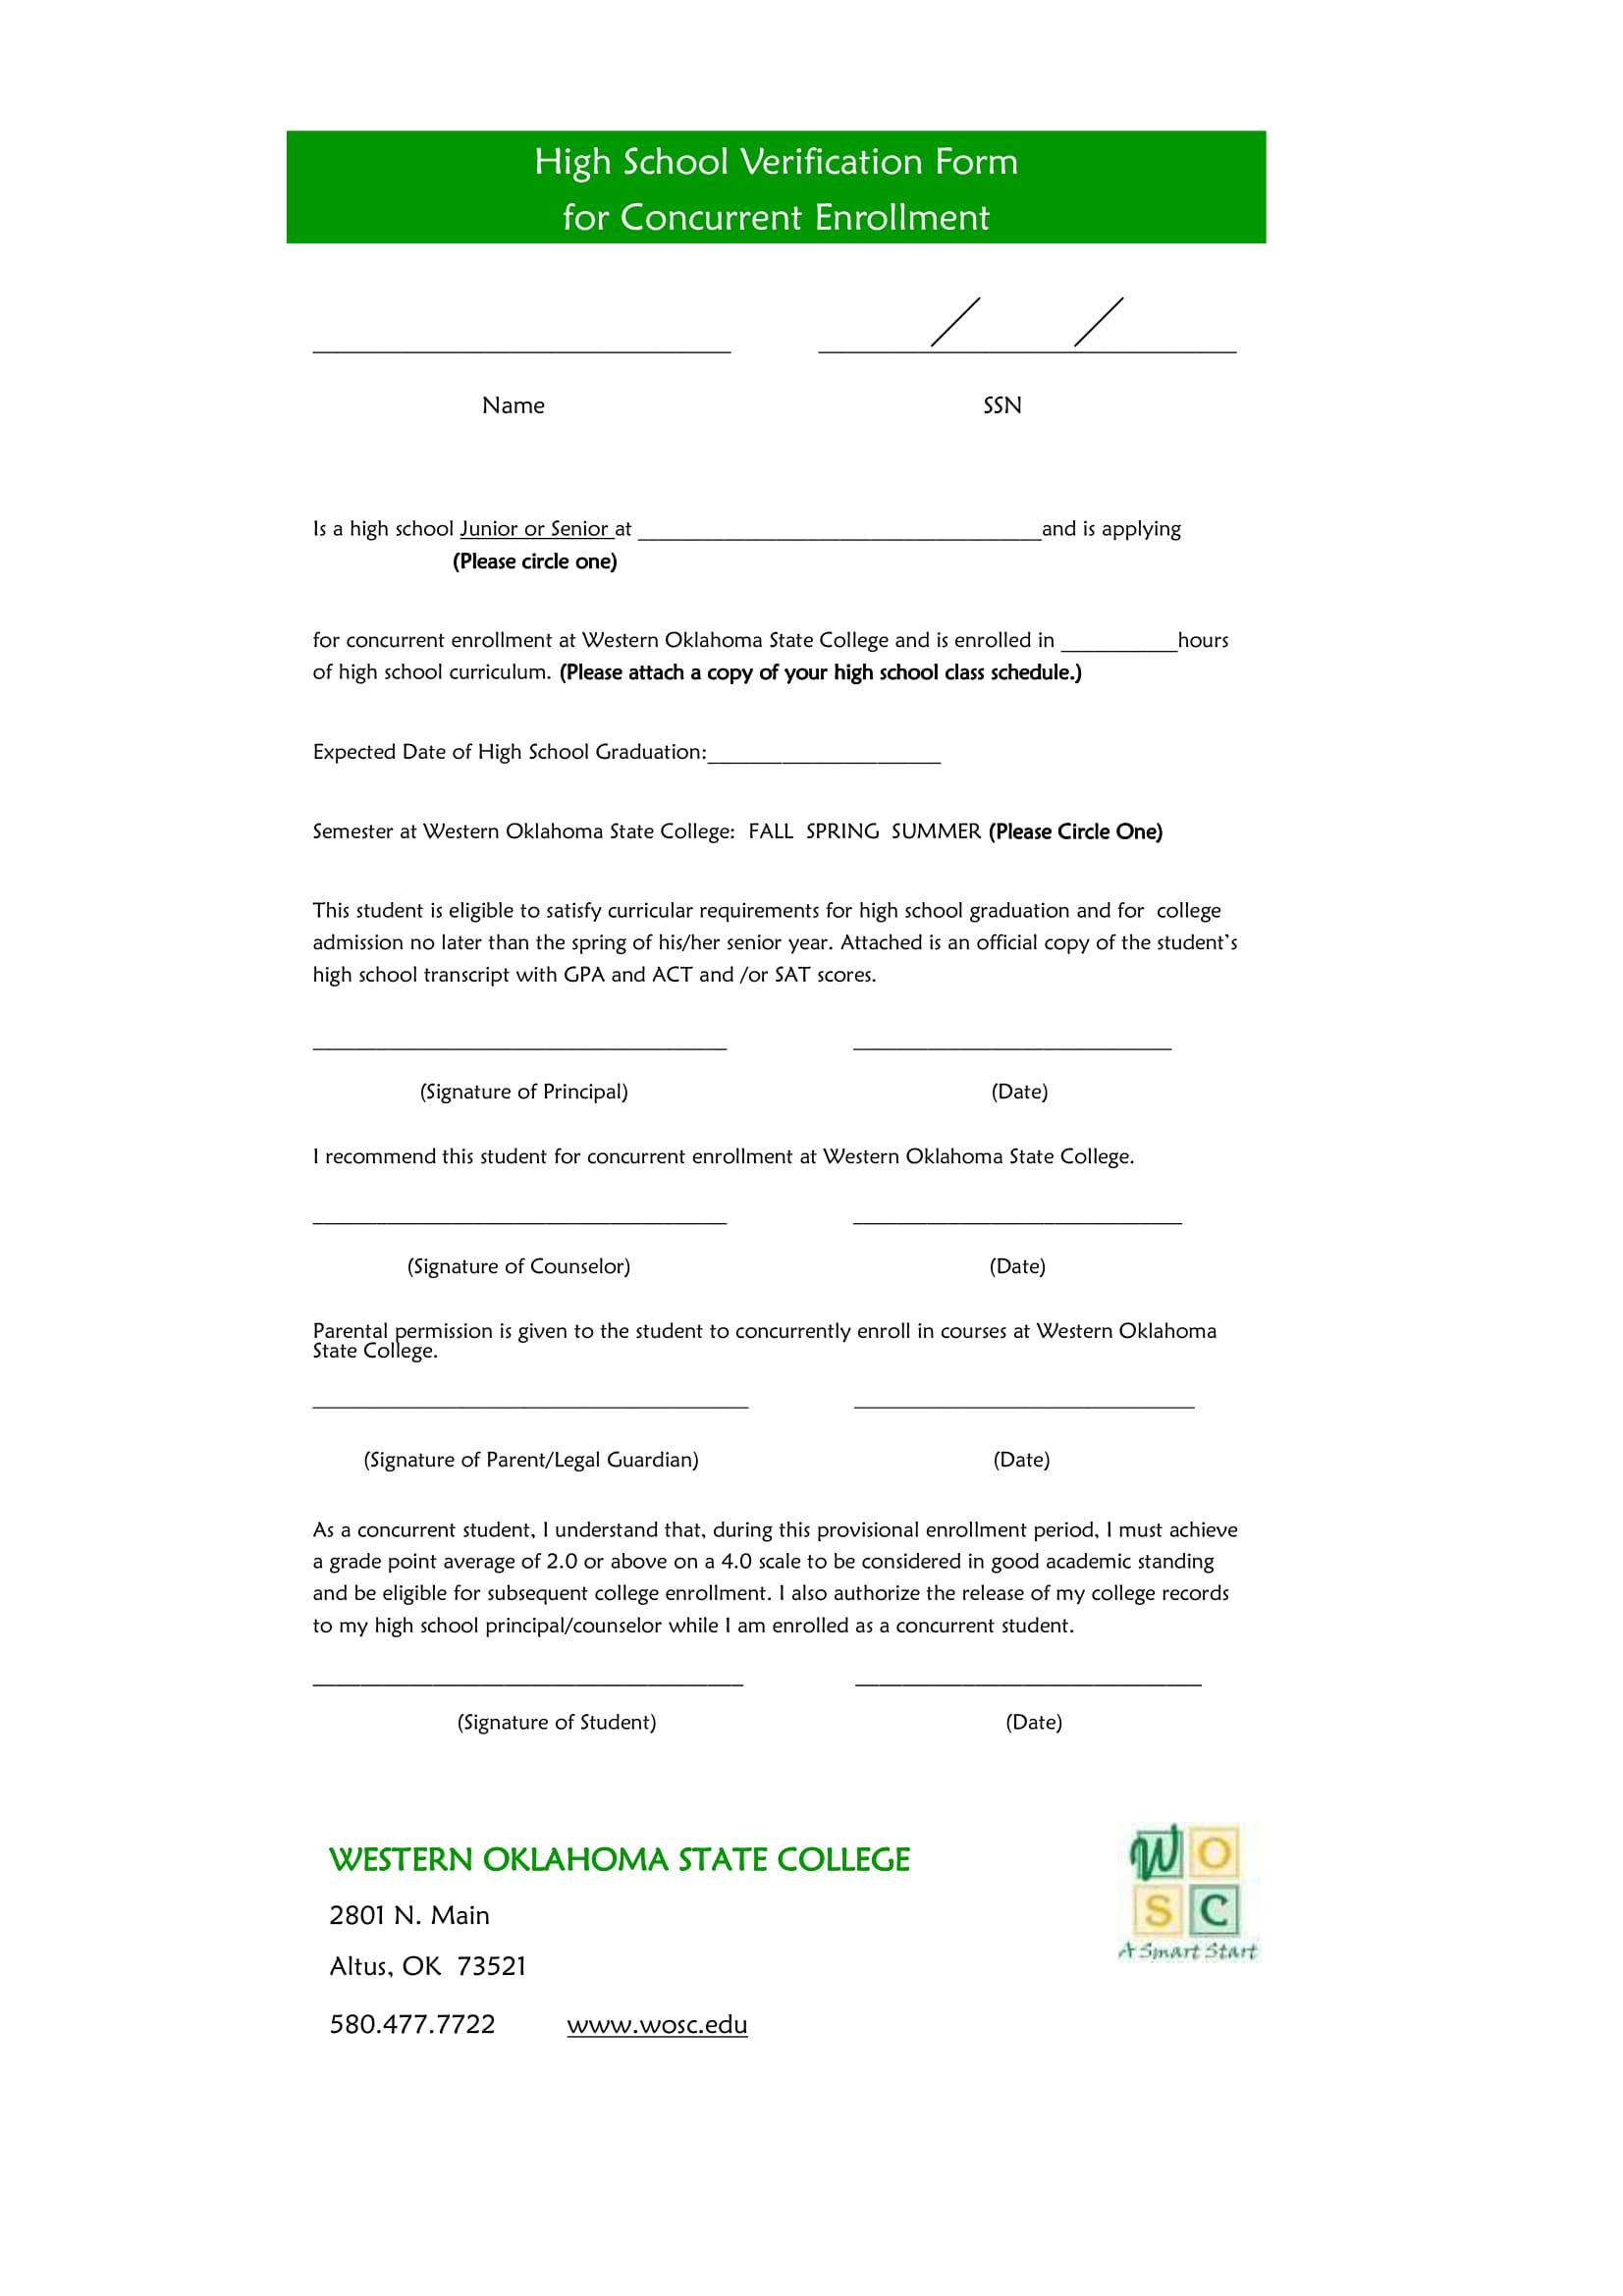 high school verification form for concurrent enrollment 1